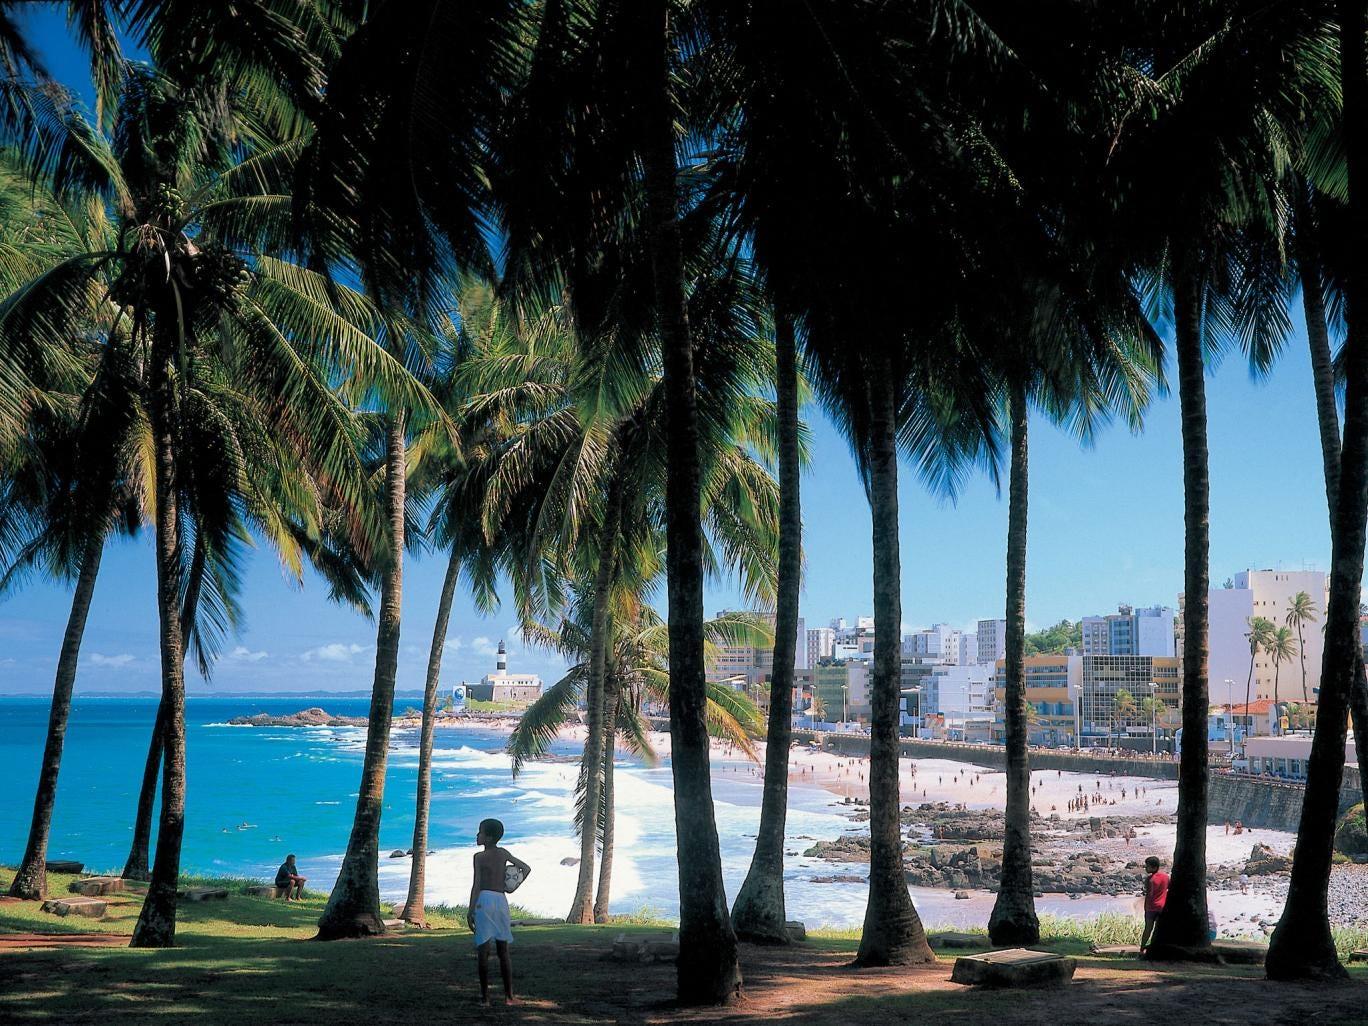 Salvador's shoreline and the Barra lighthouse